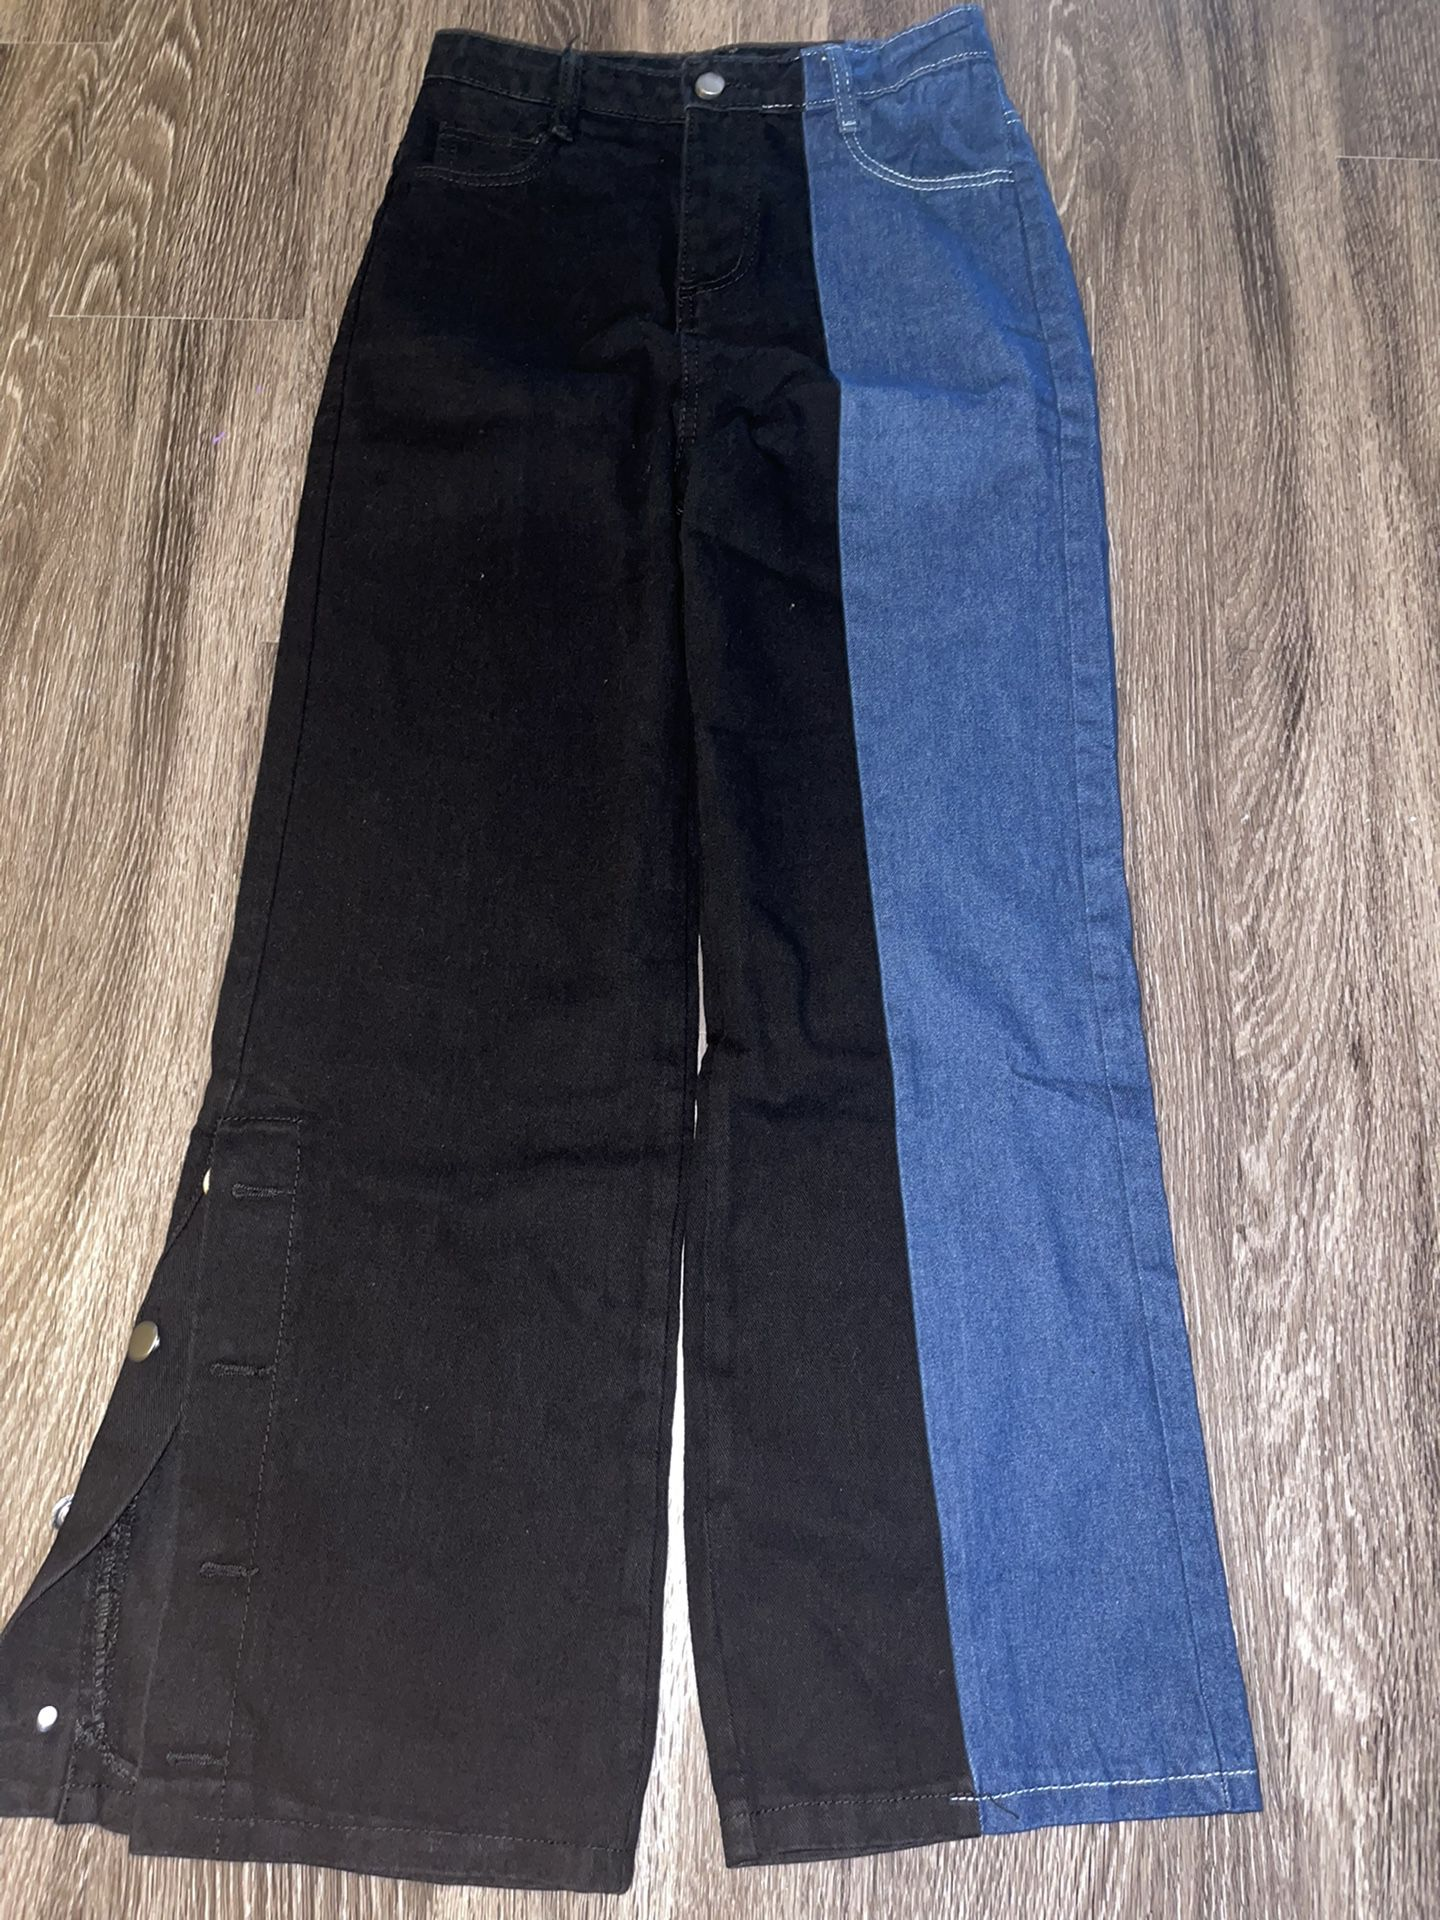 Vintage Two Color Jeans